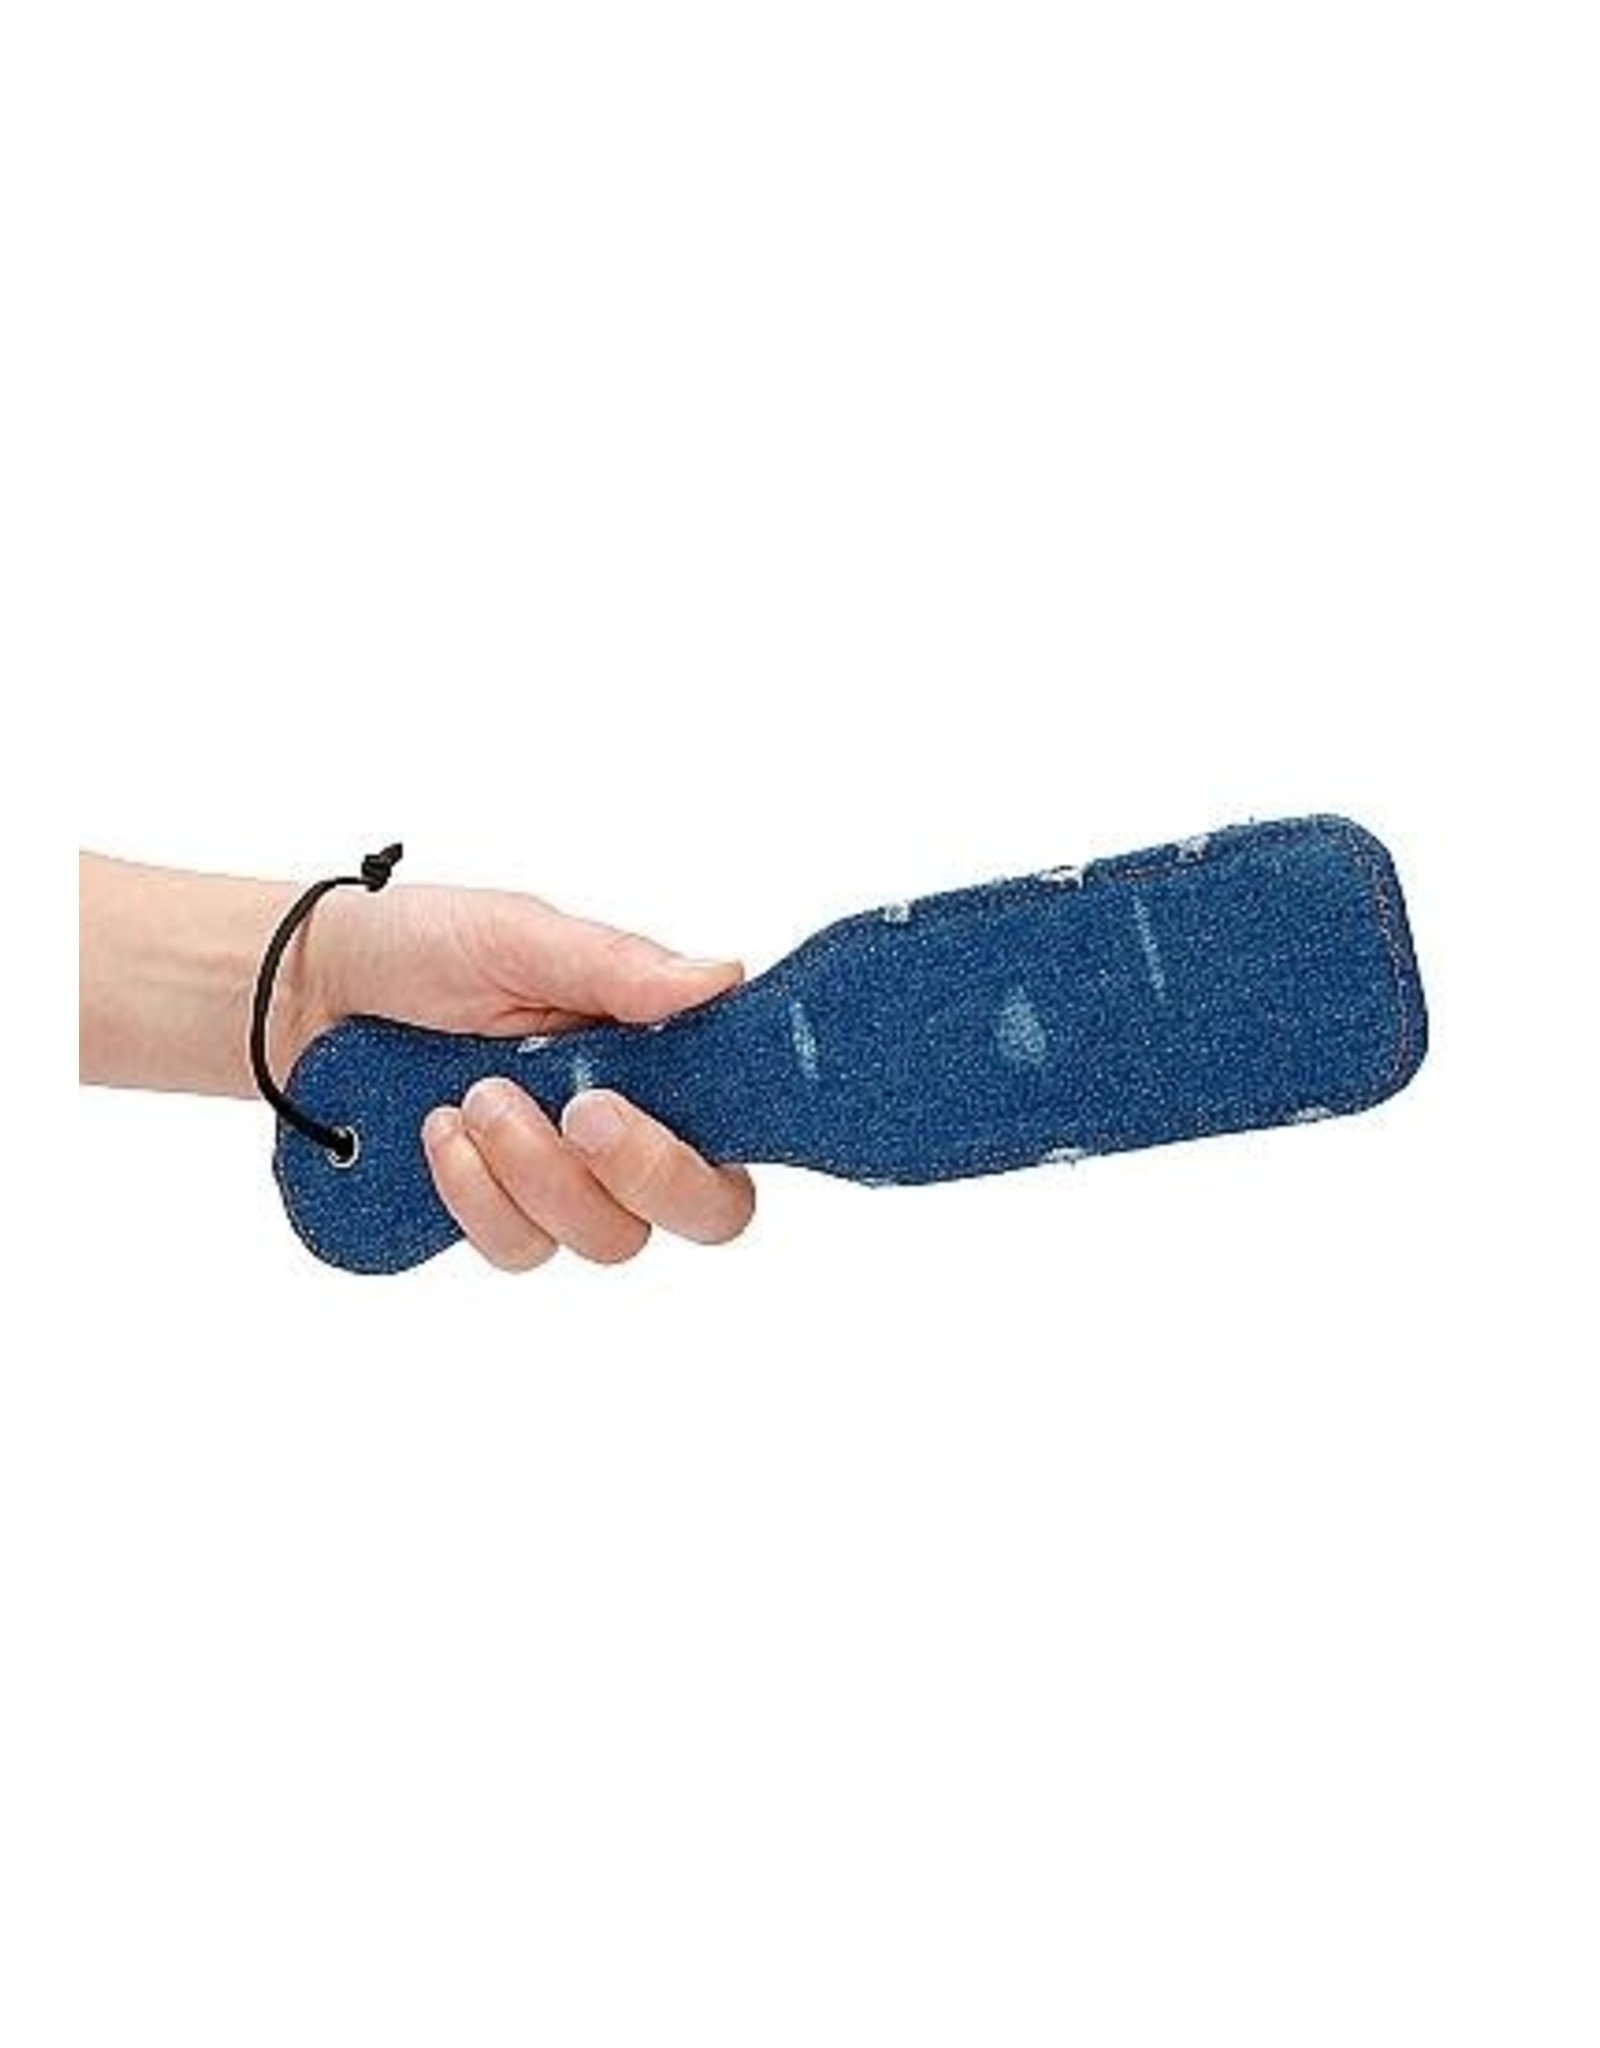 Ouch! Denim Paddle - Roughend Denim Style - Blue